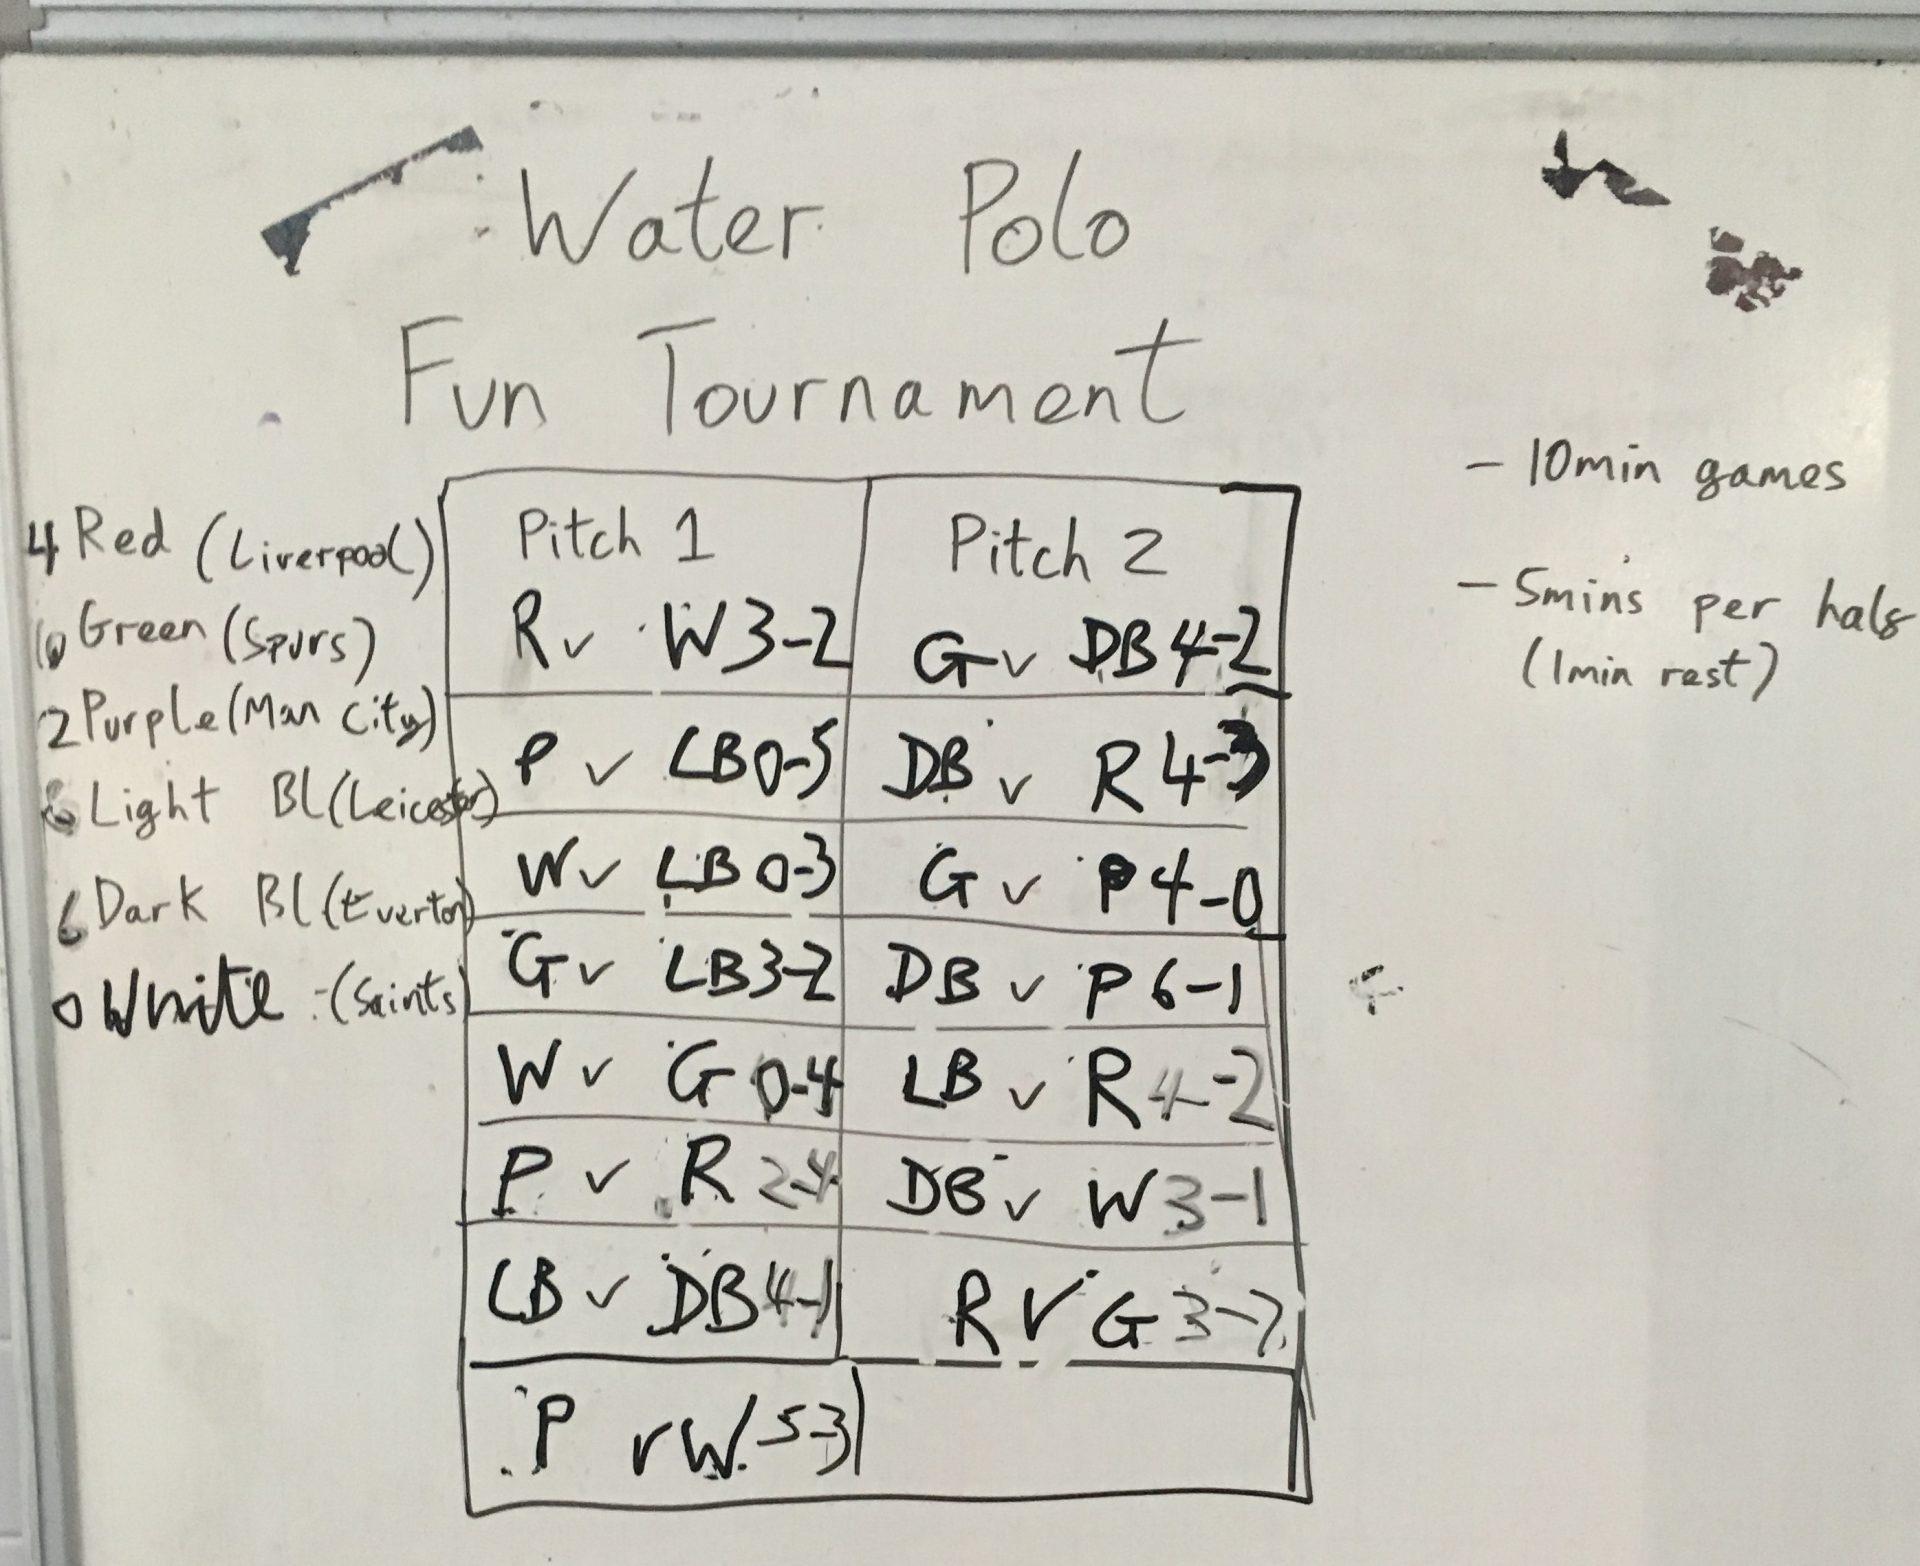 Scoreboard showing team names for the Fun Tournament